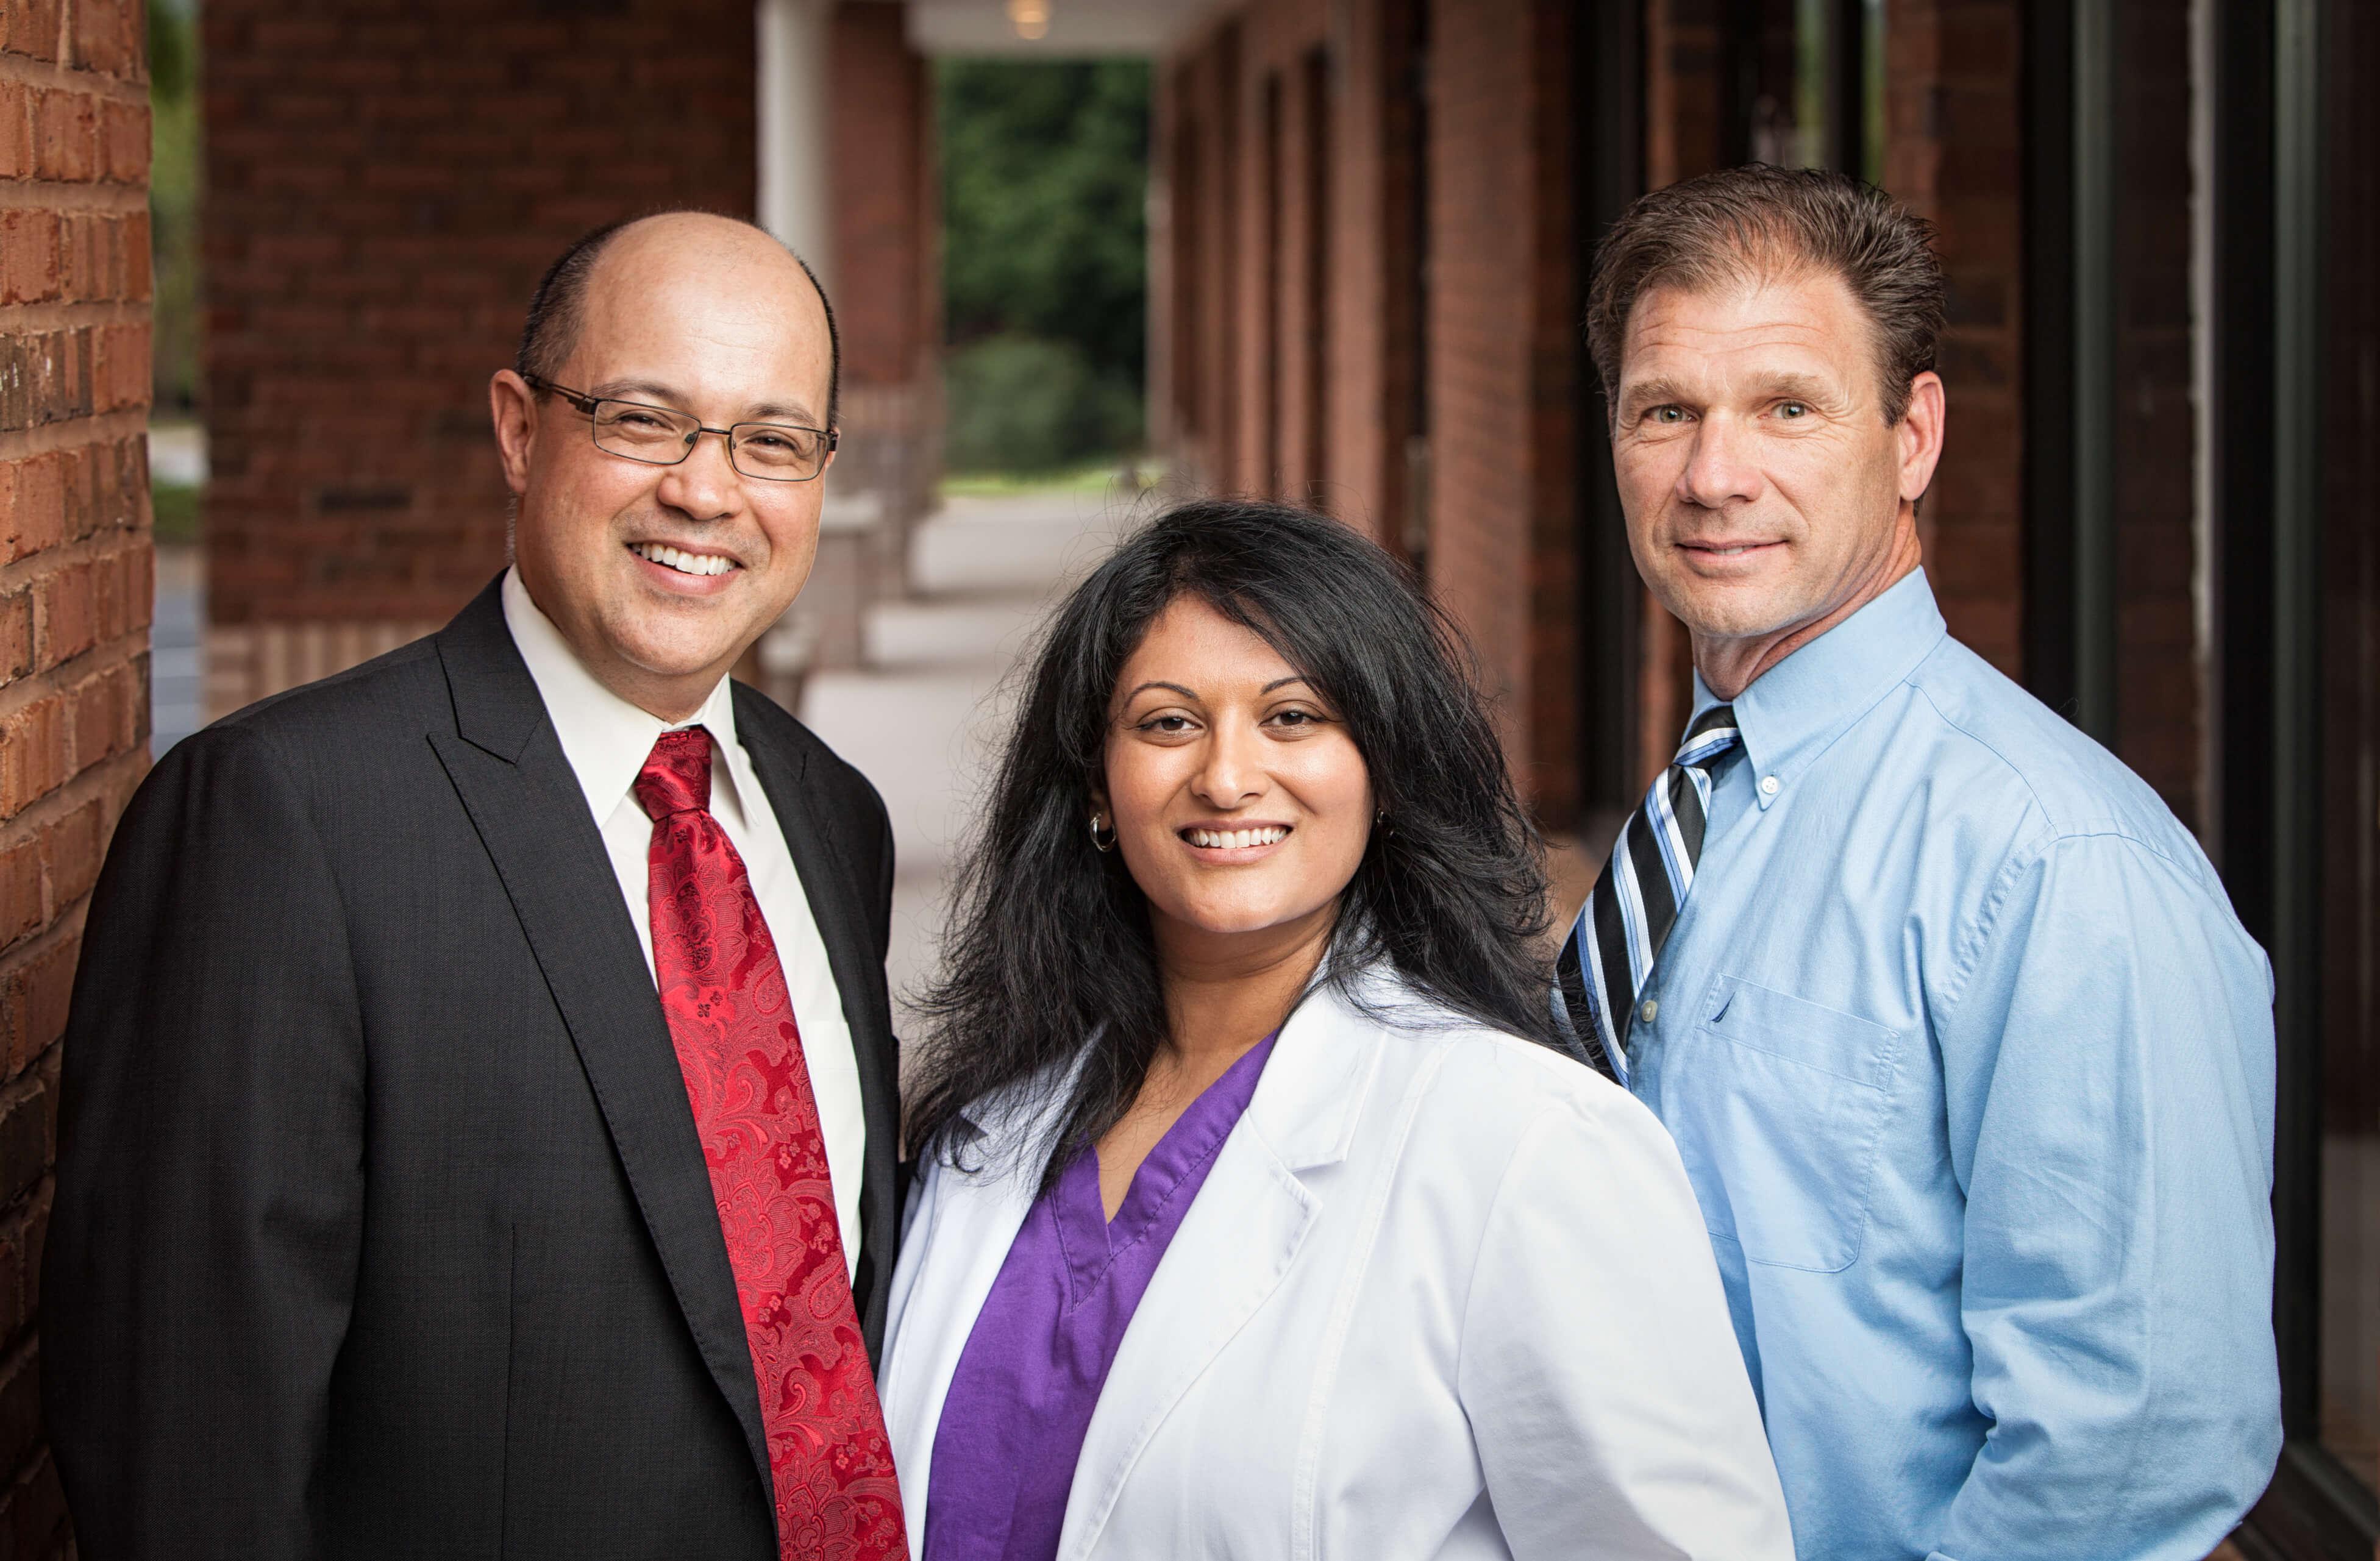 Urogynecology Subspecialists, Woodstock, Canton